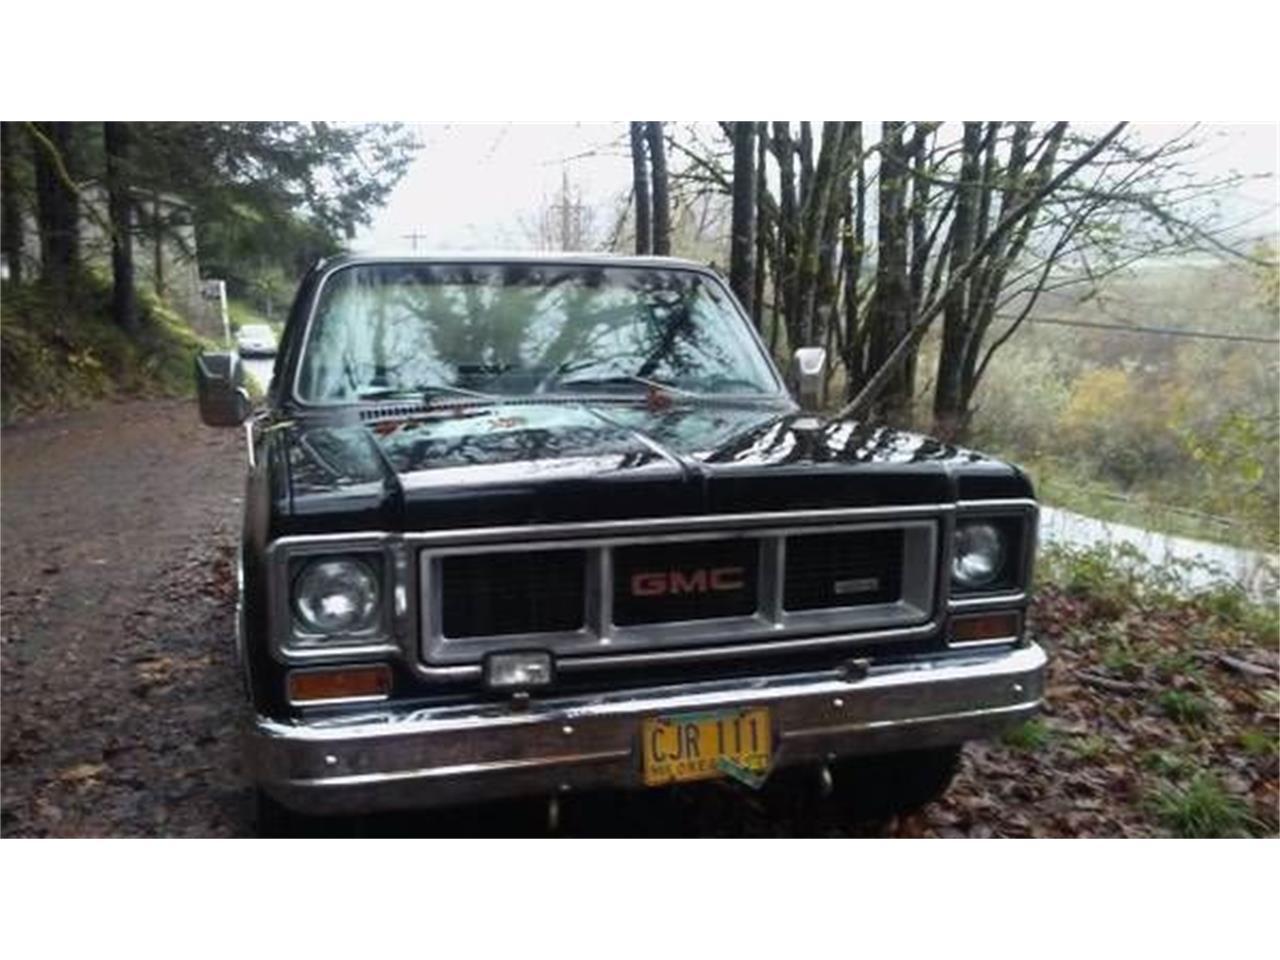 For Sale: 1974 GMC Sierra in Cadillac, Michigan